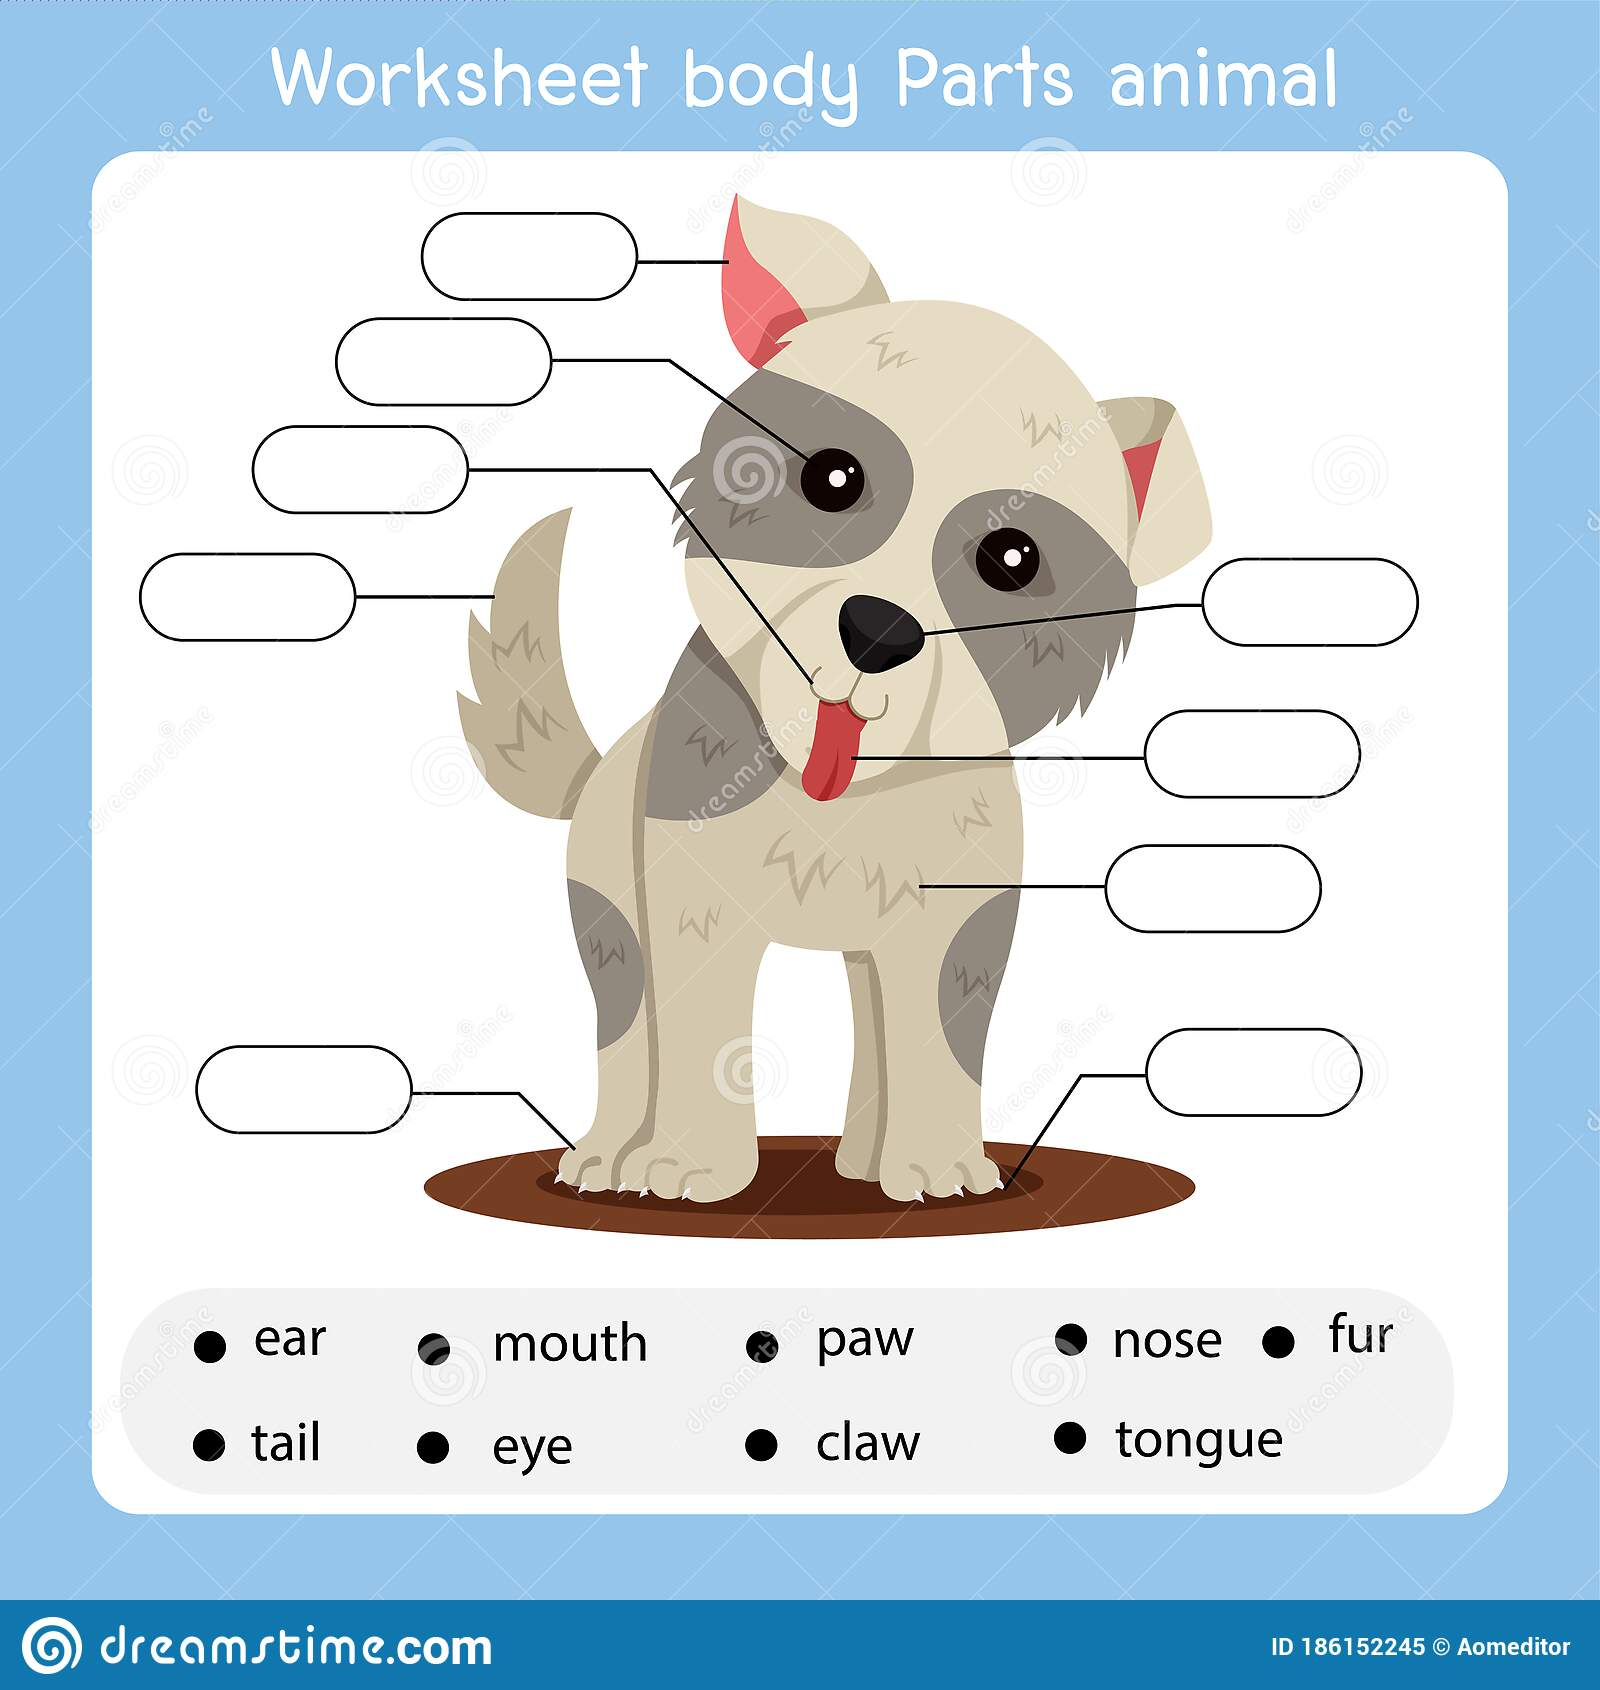 Illustrator Of Worksheet Body Parts Dog Animal Stock